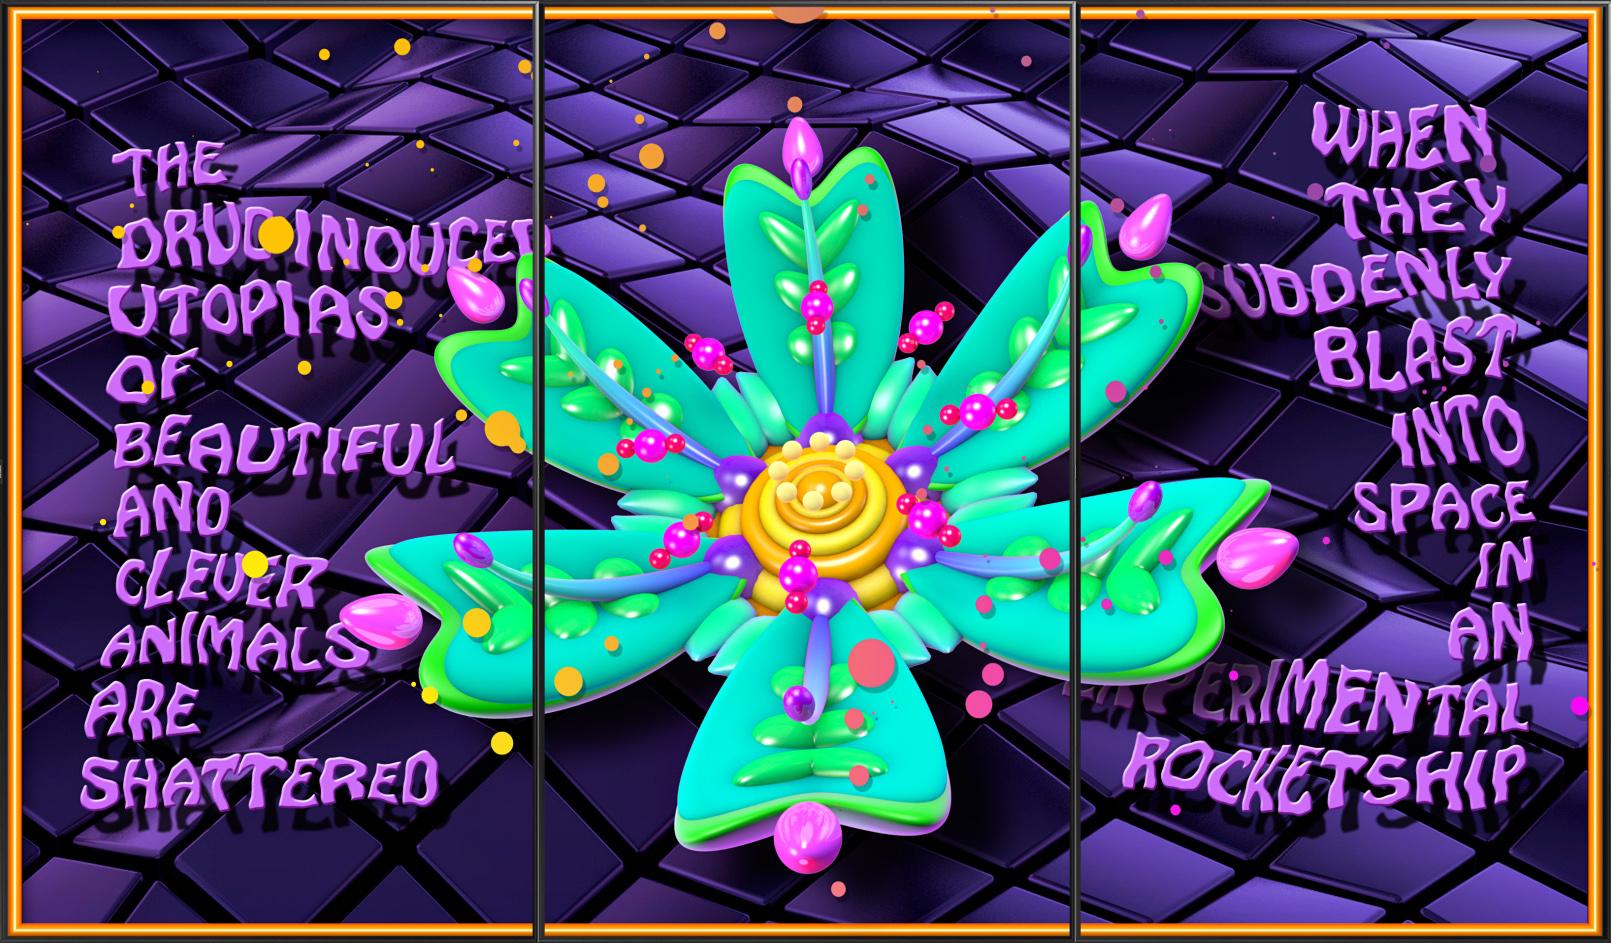 blossom_0004_Blossom - Sample Image - 11.jpg